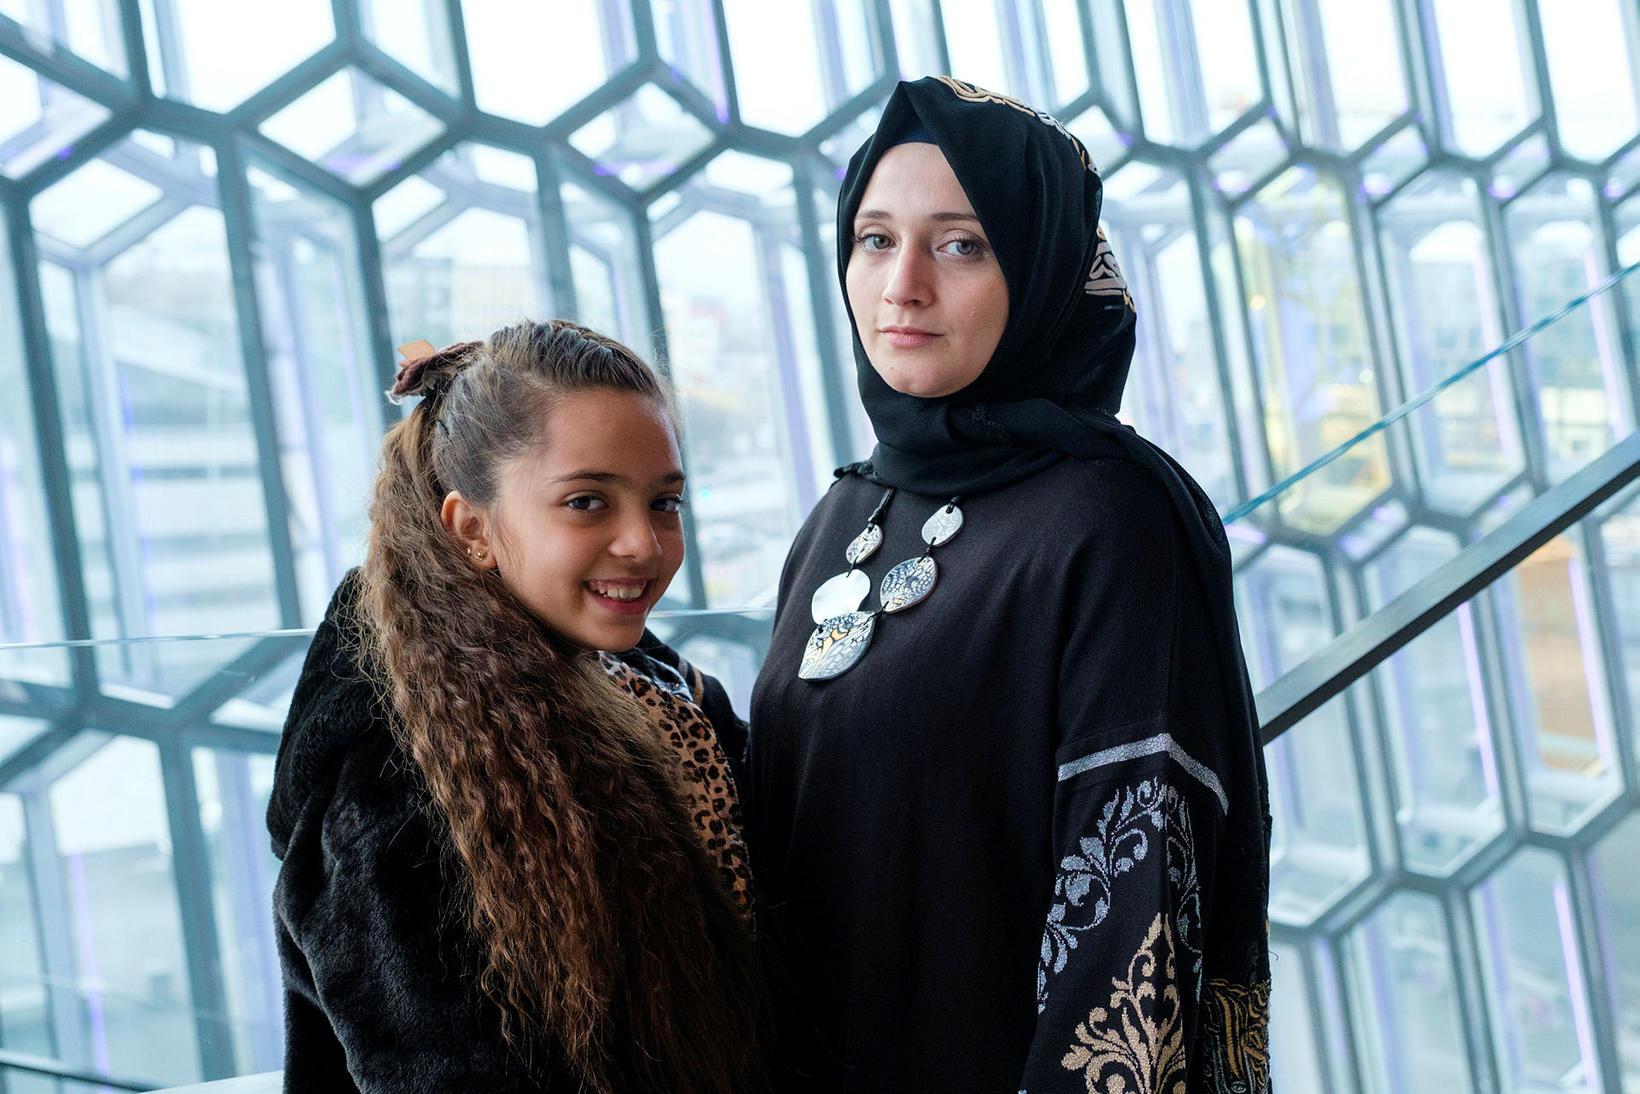 Bana al-Abed og mama hennar Falemah en hún var enskukennari …